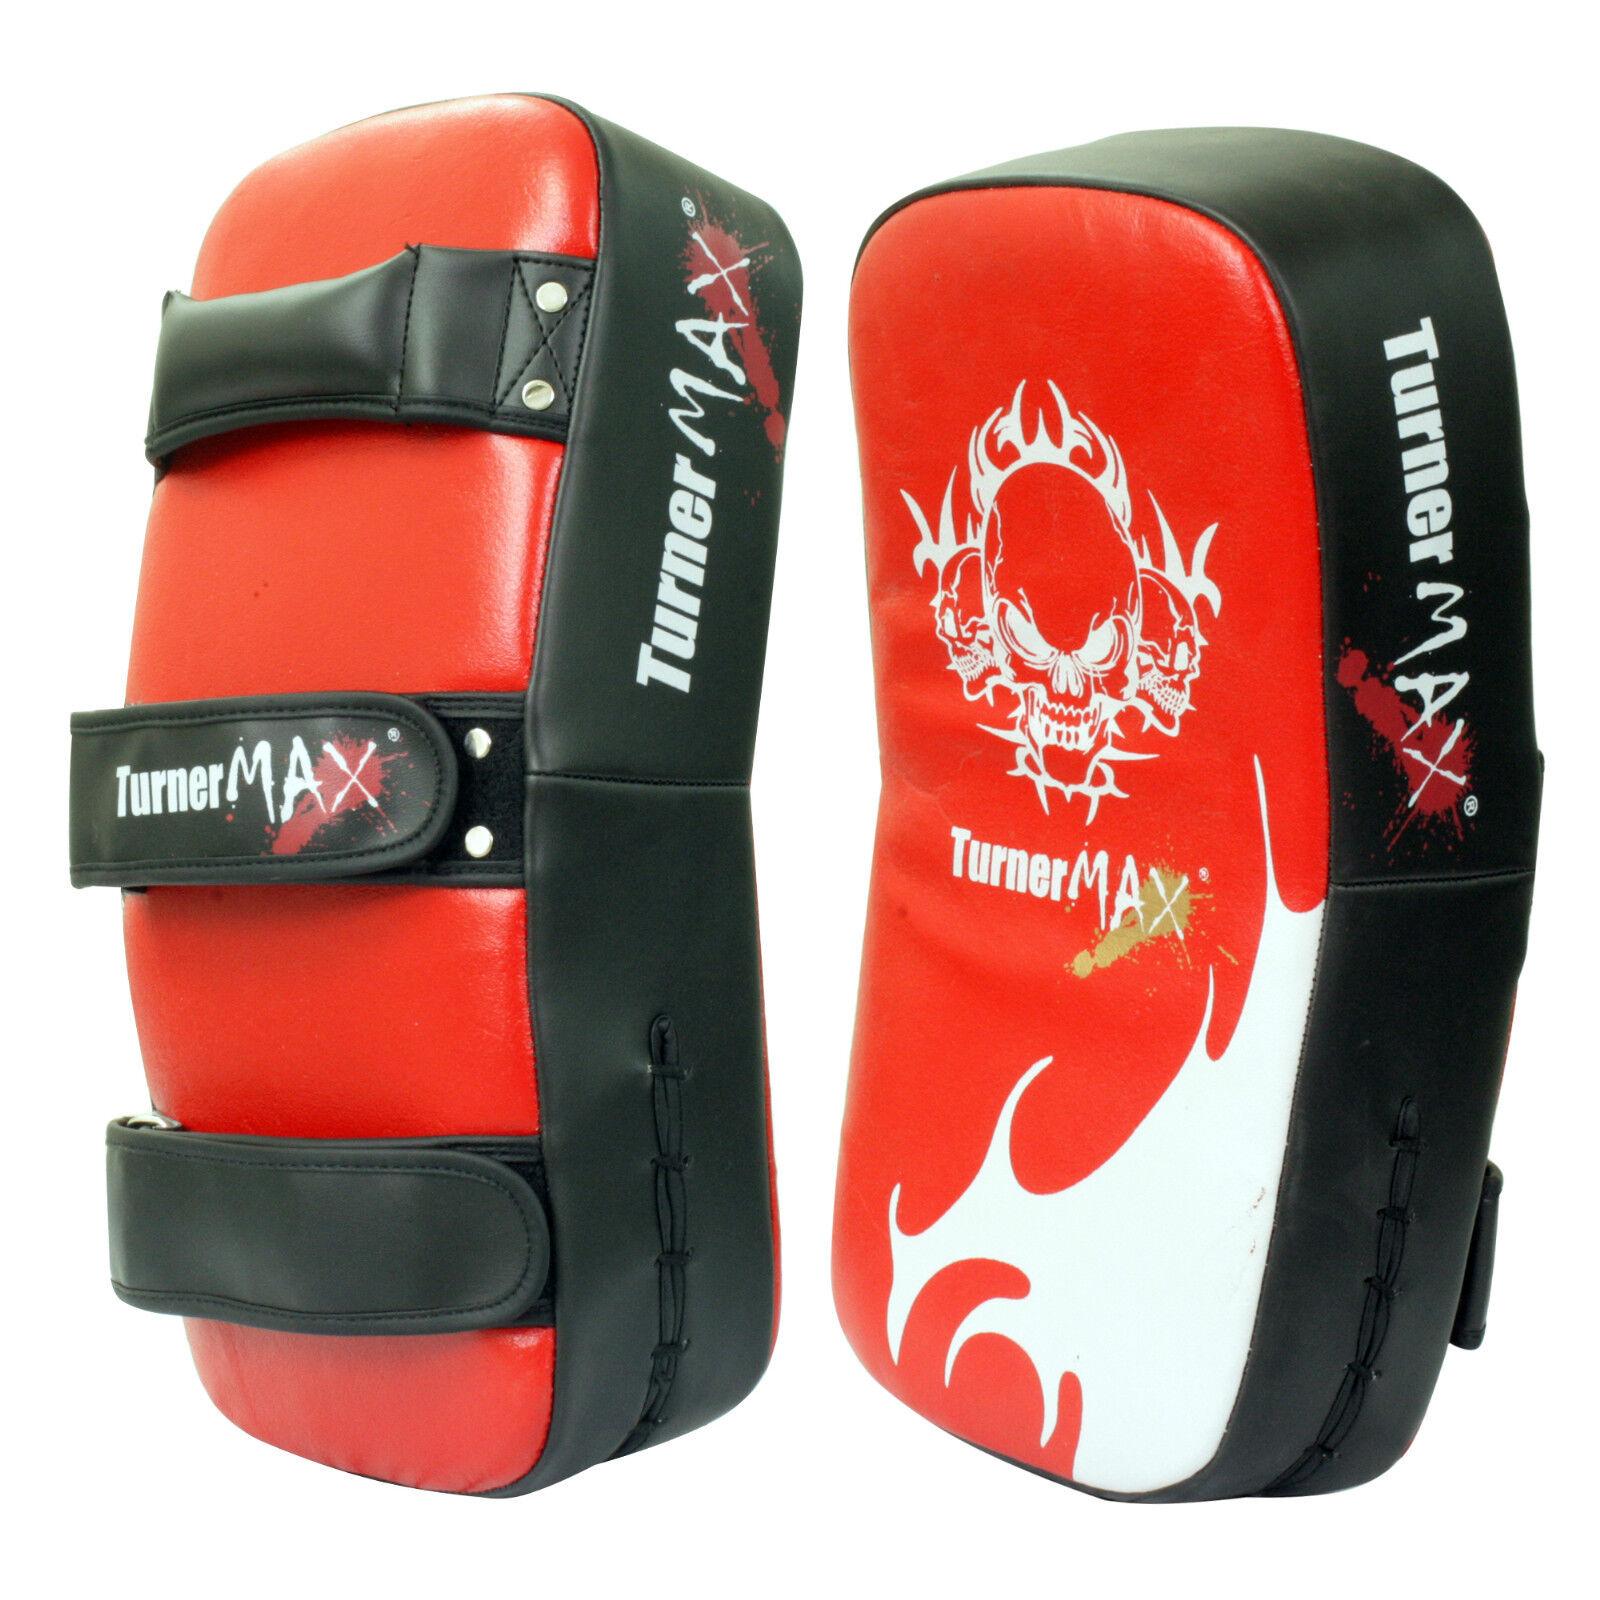 TurnerMAX Curved Thai Pad Punching Martial Arts Kick Boxing Strike Shield SINGLE